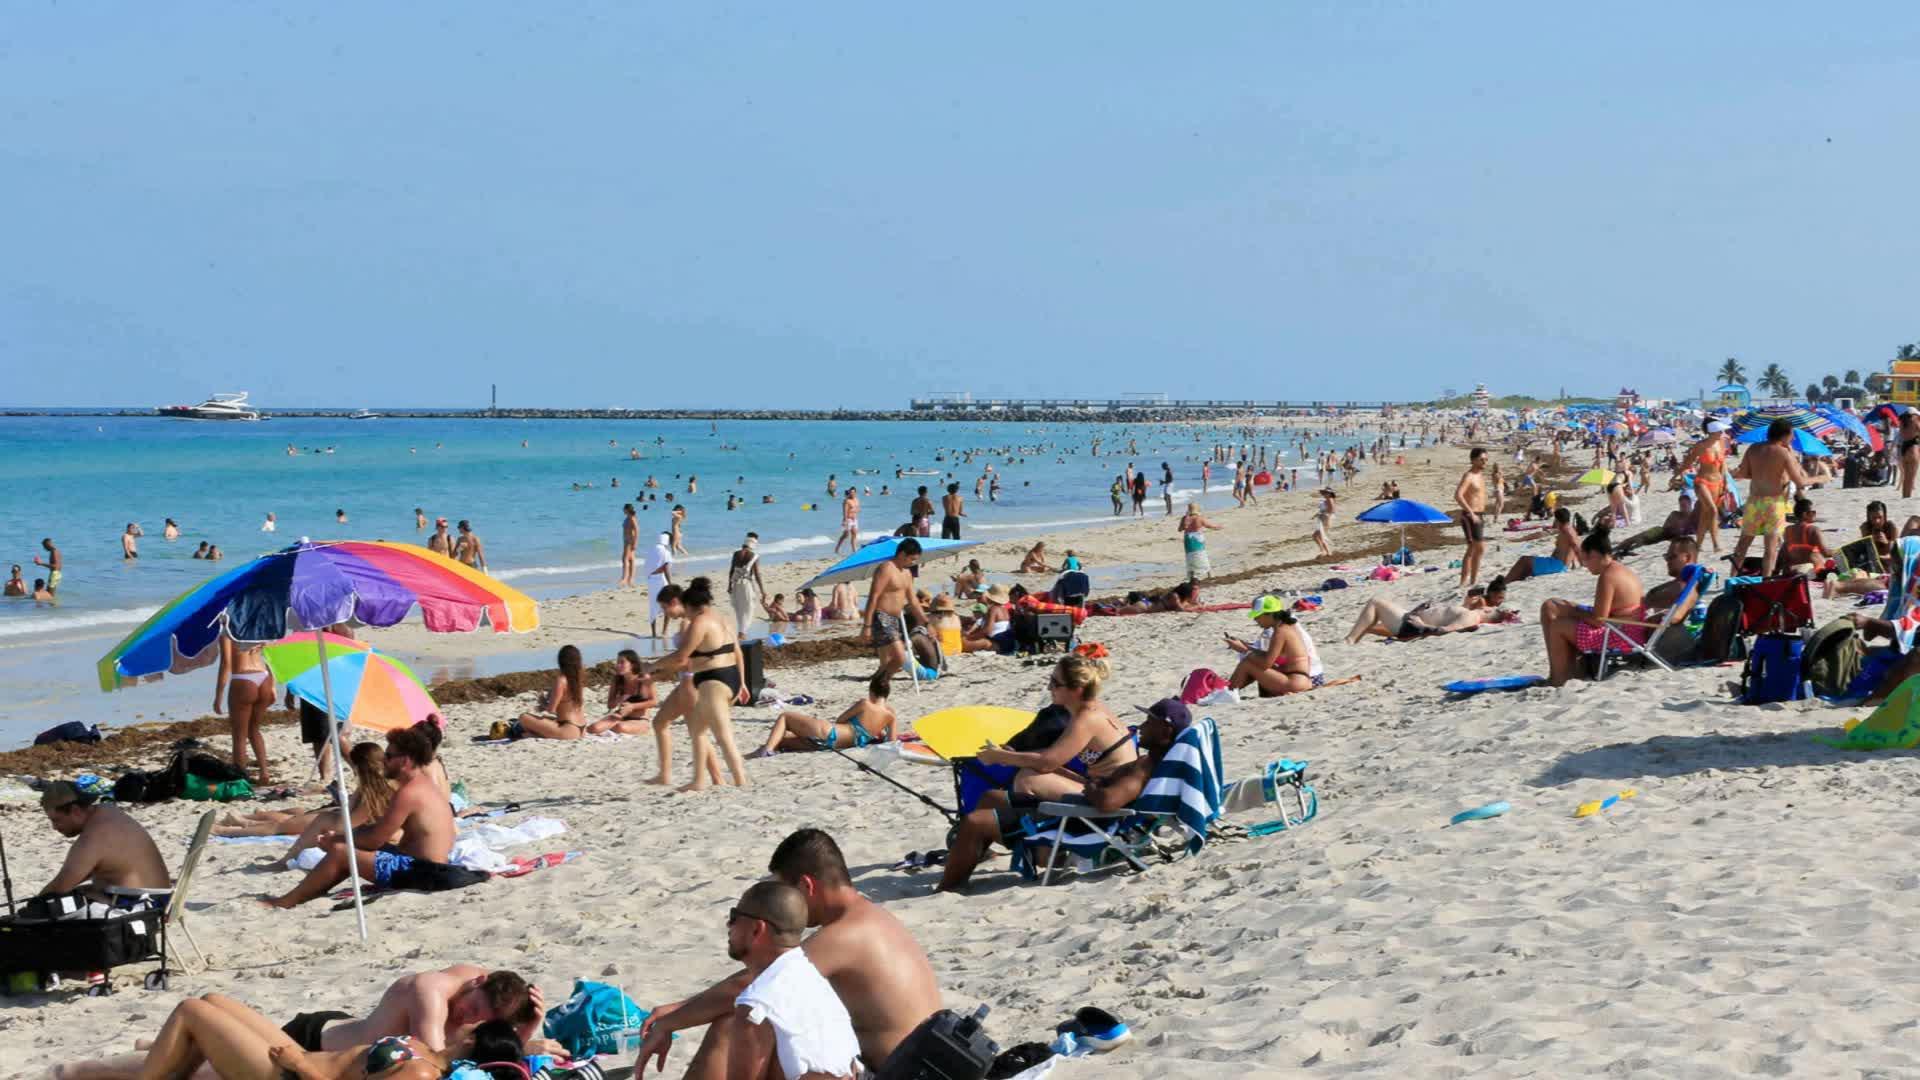 Miami Dade County Closes Beaches. (Getty Images via CNN)